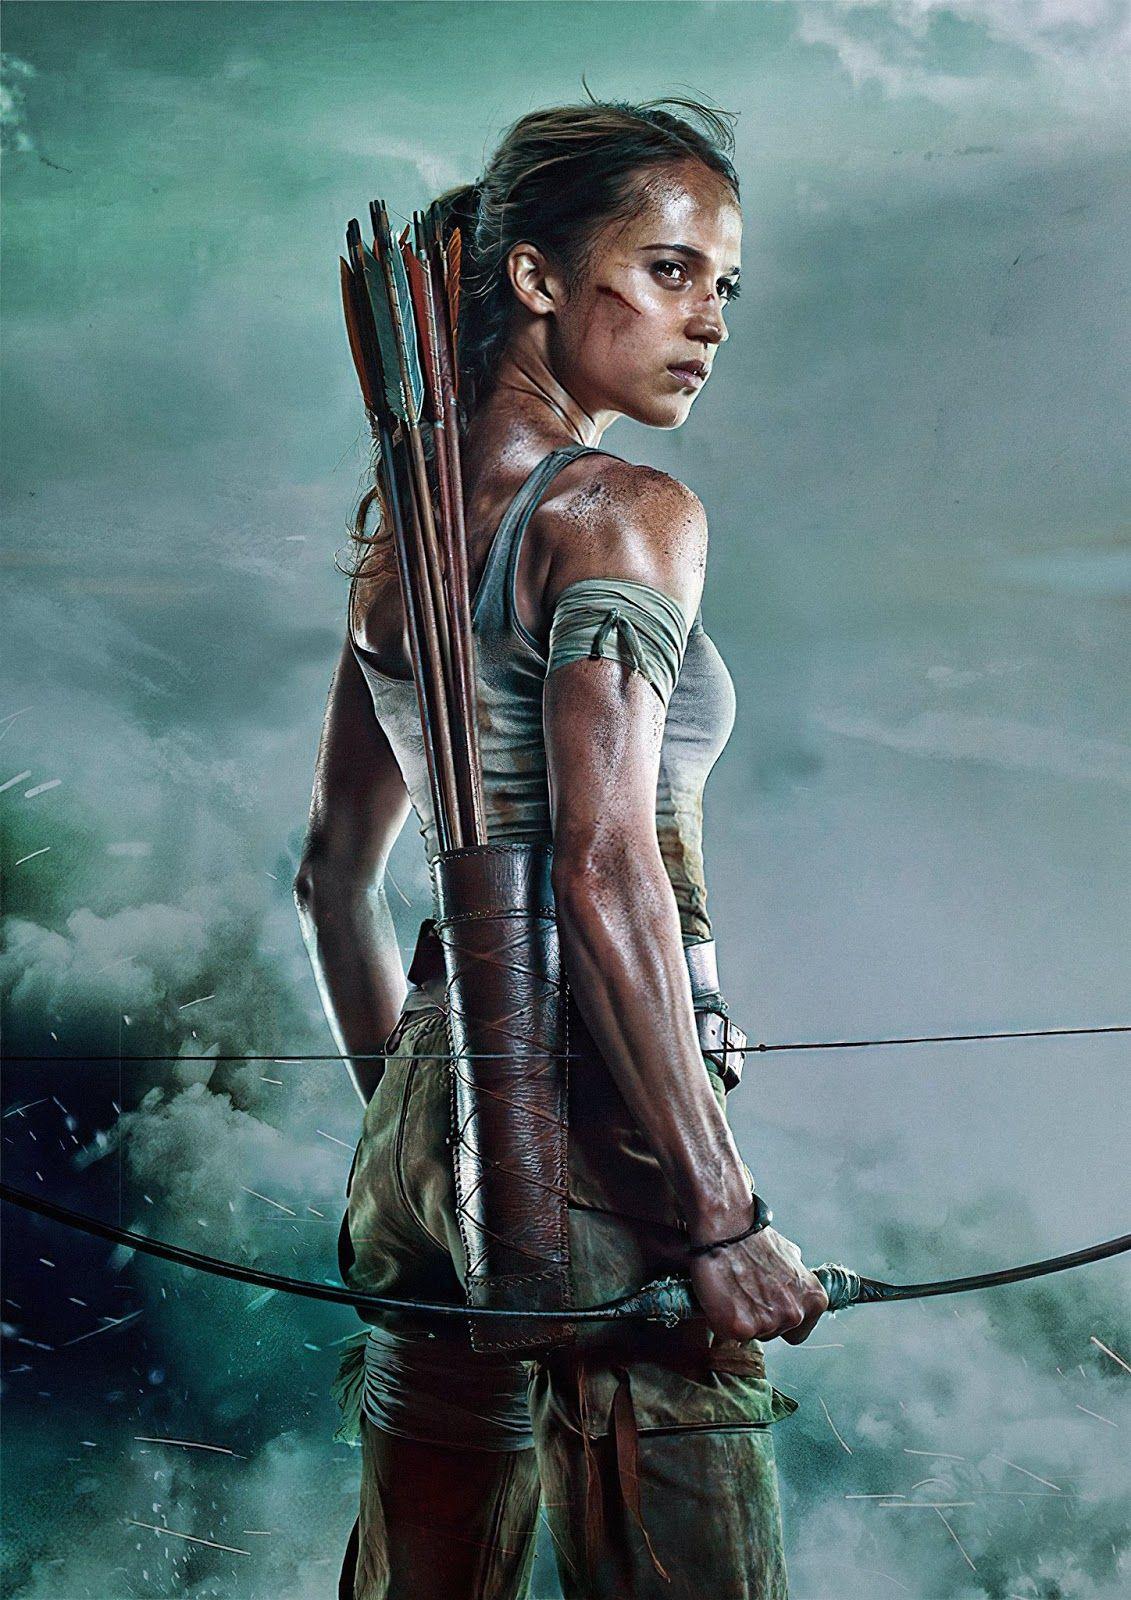 Tomb Raider (2018) Folder Icon 1 by van1518 on DeviantArt